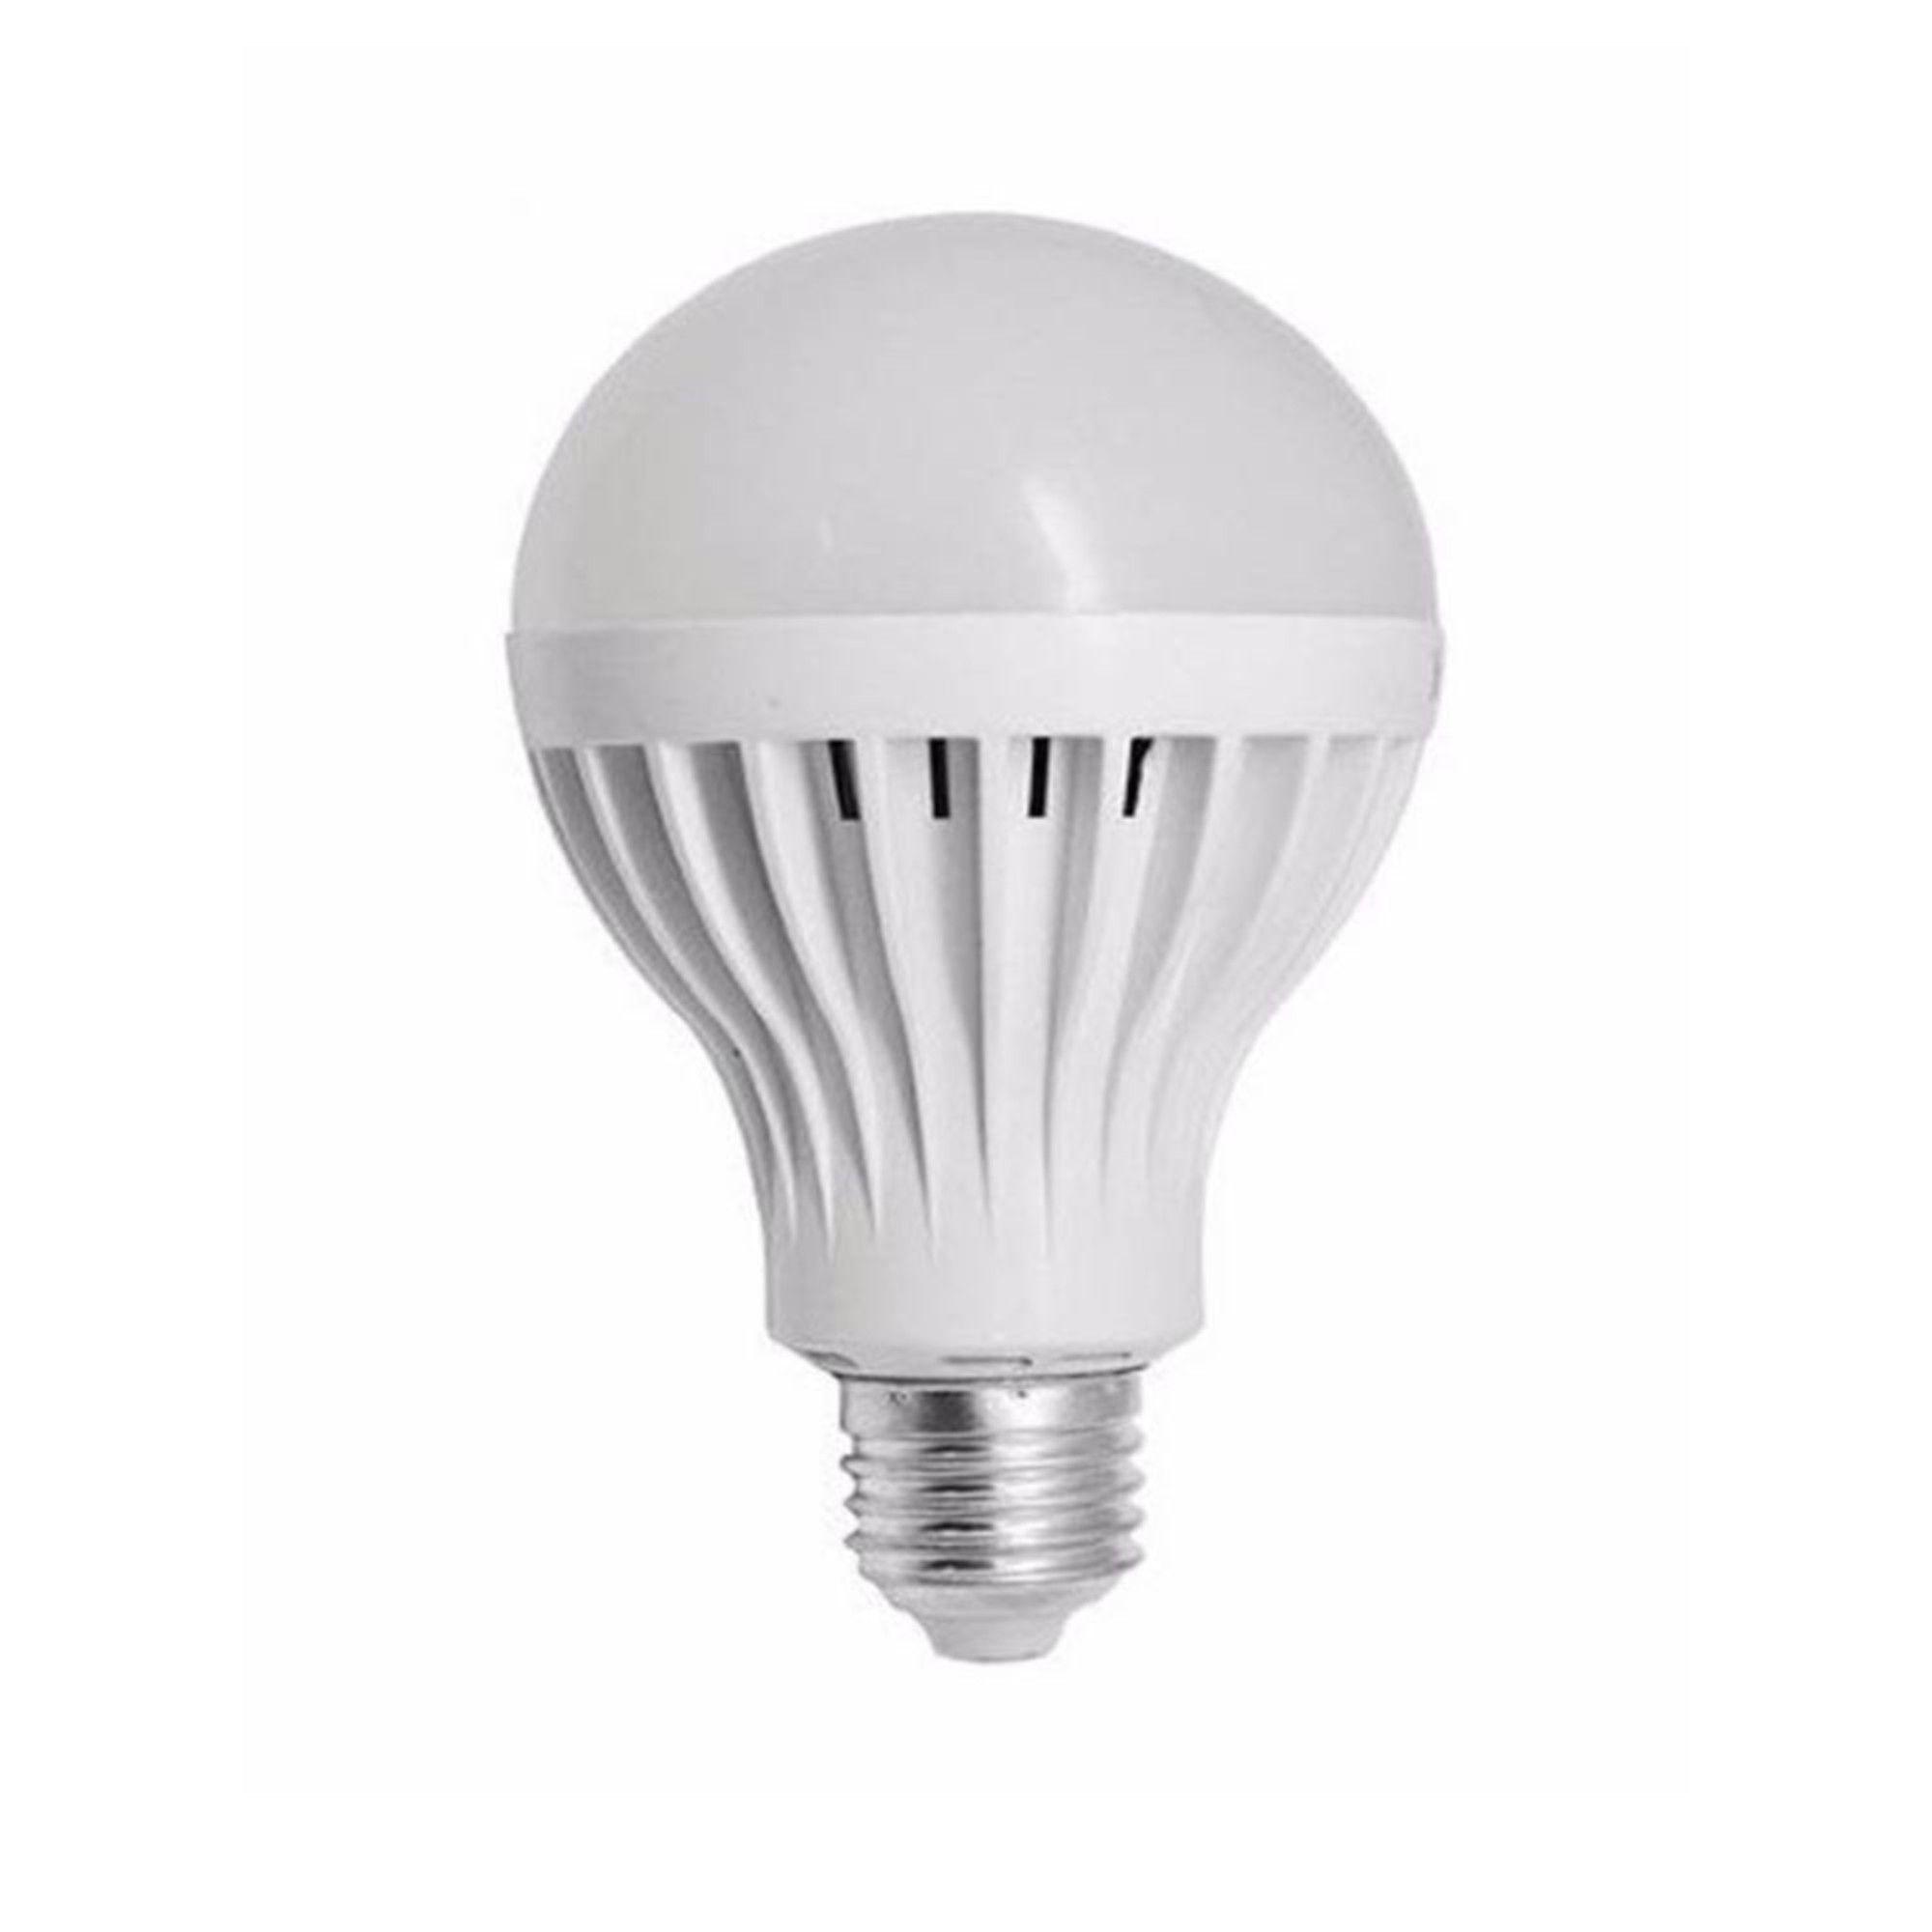 Lâmpada Led Bulbo 5w Branco Frio Bivolt E27